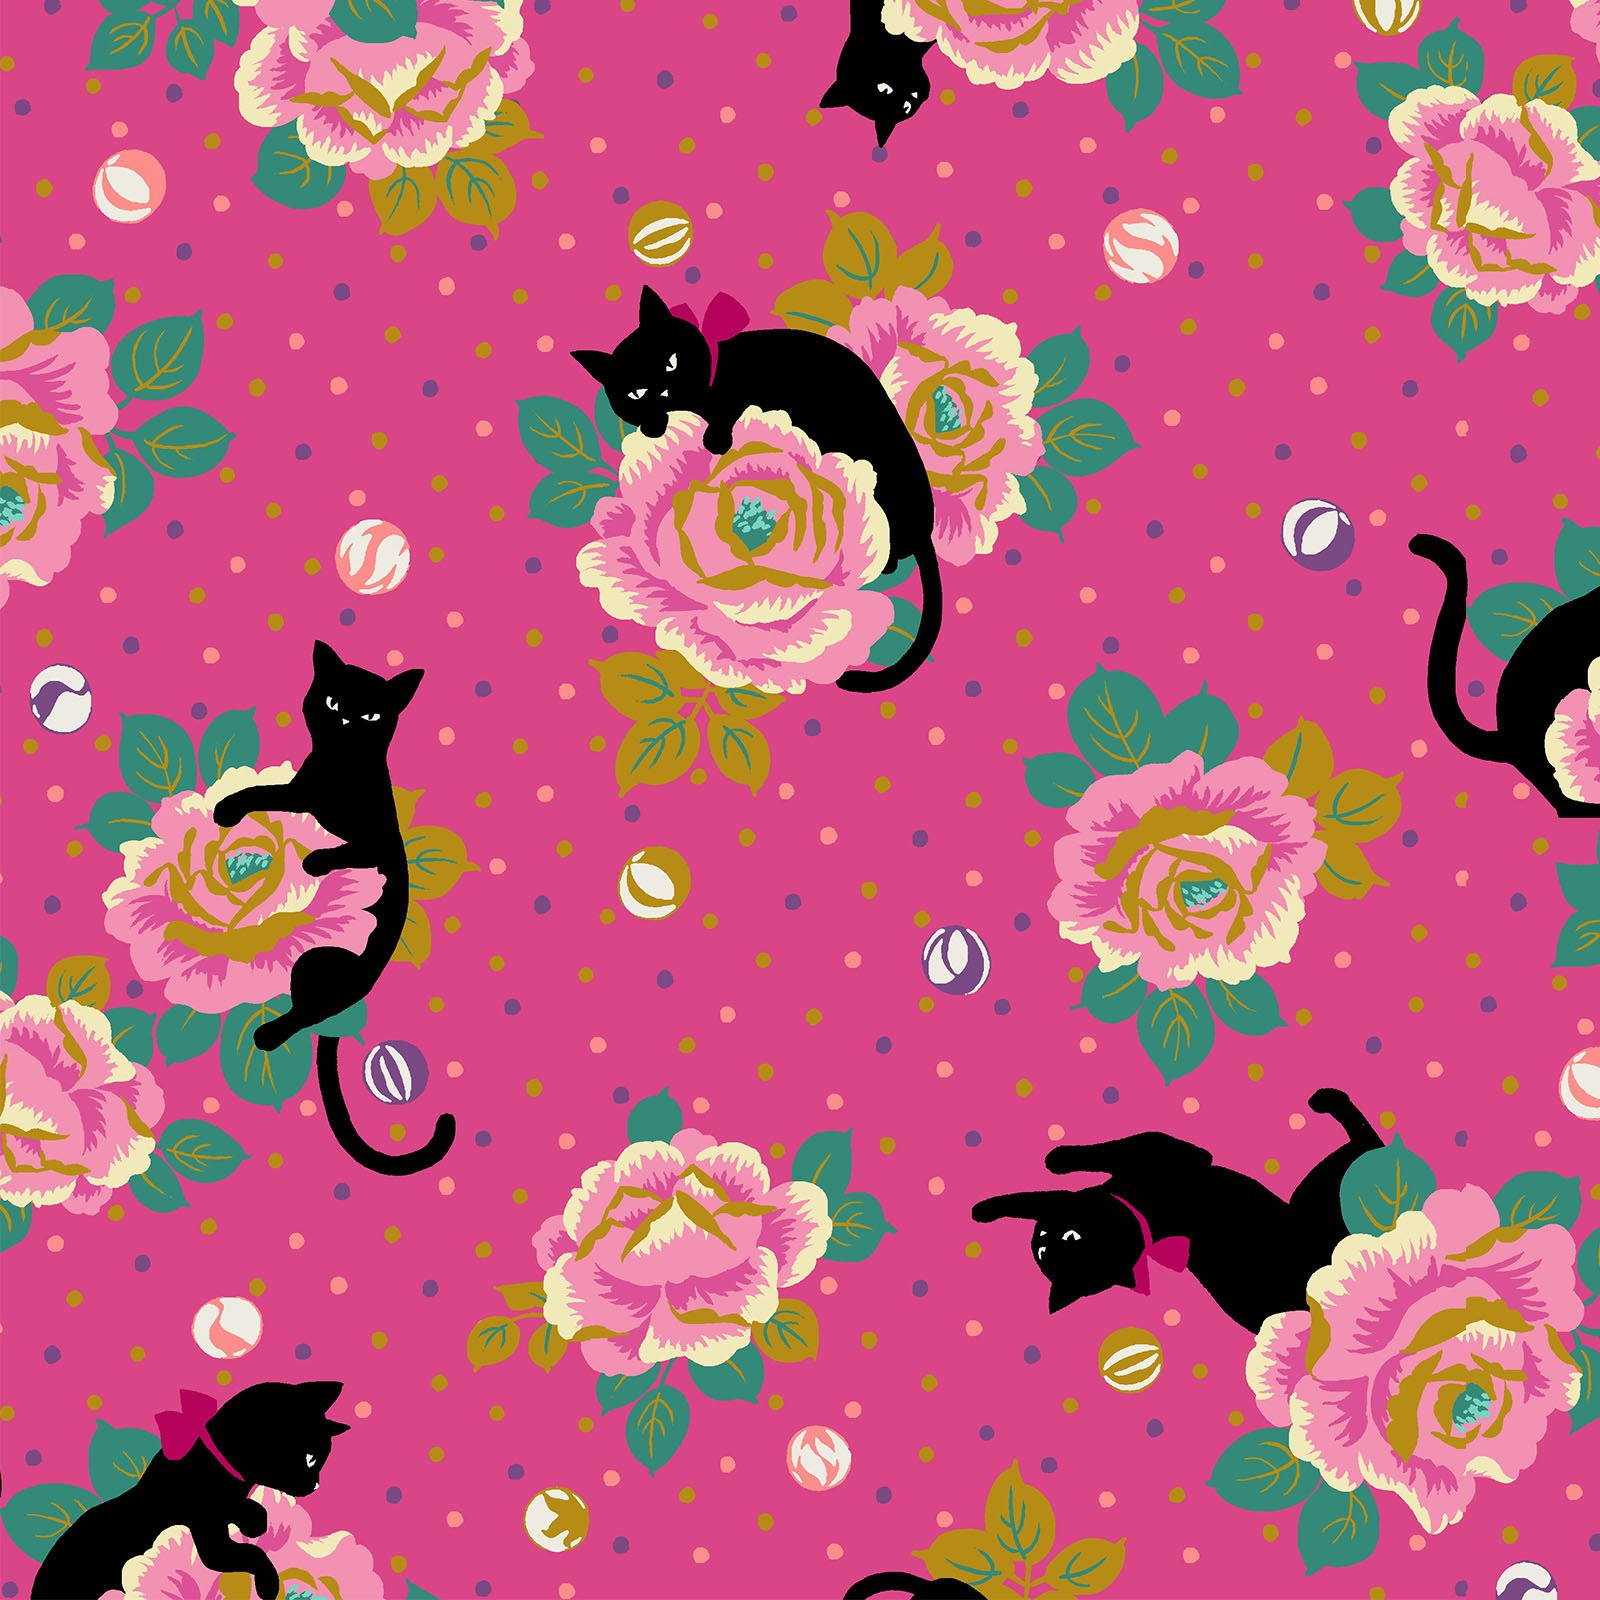 Neko 4 Metallic- Floral- Pink- Quilt Gate